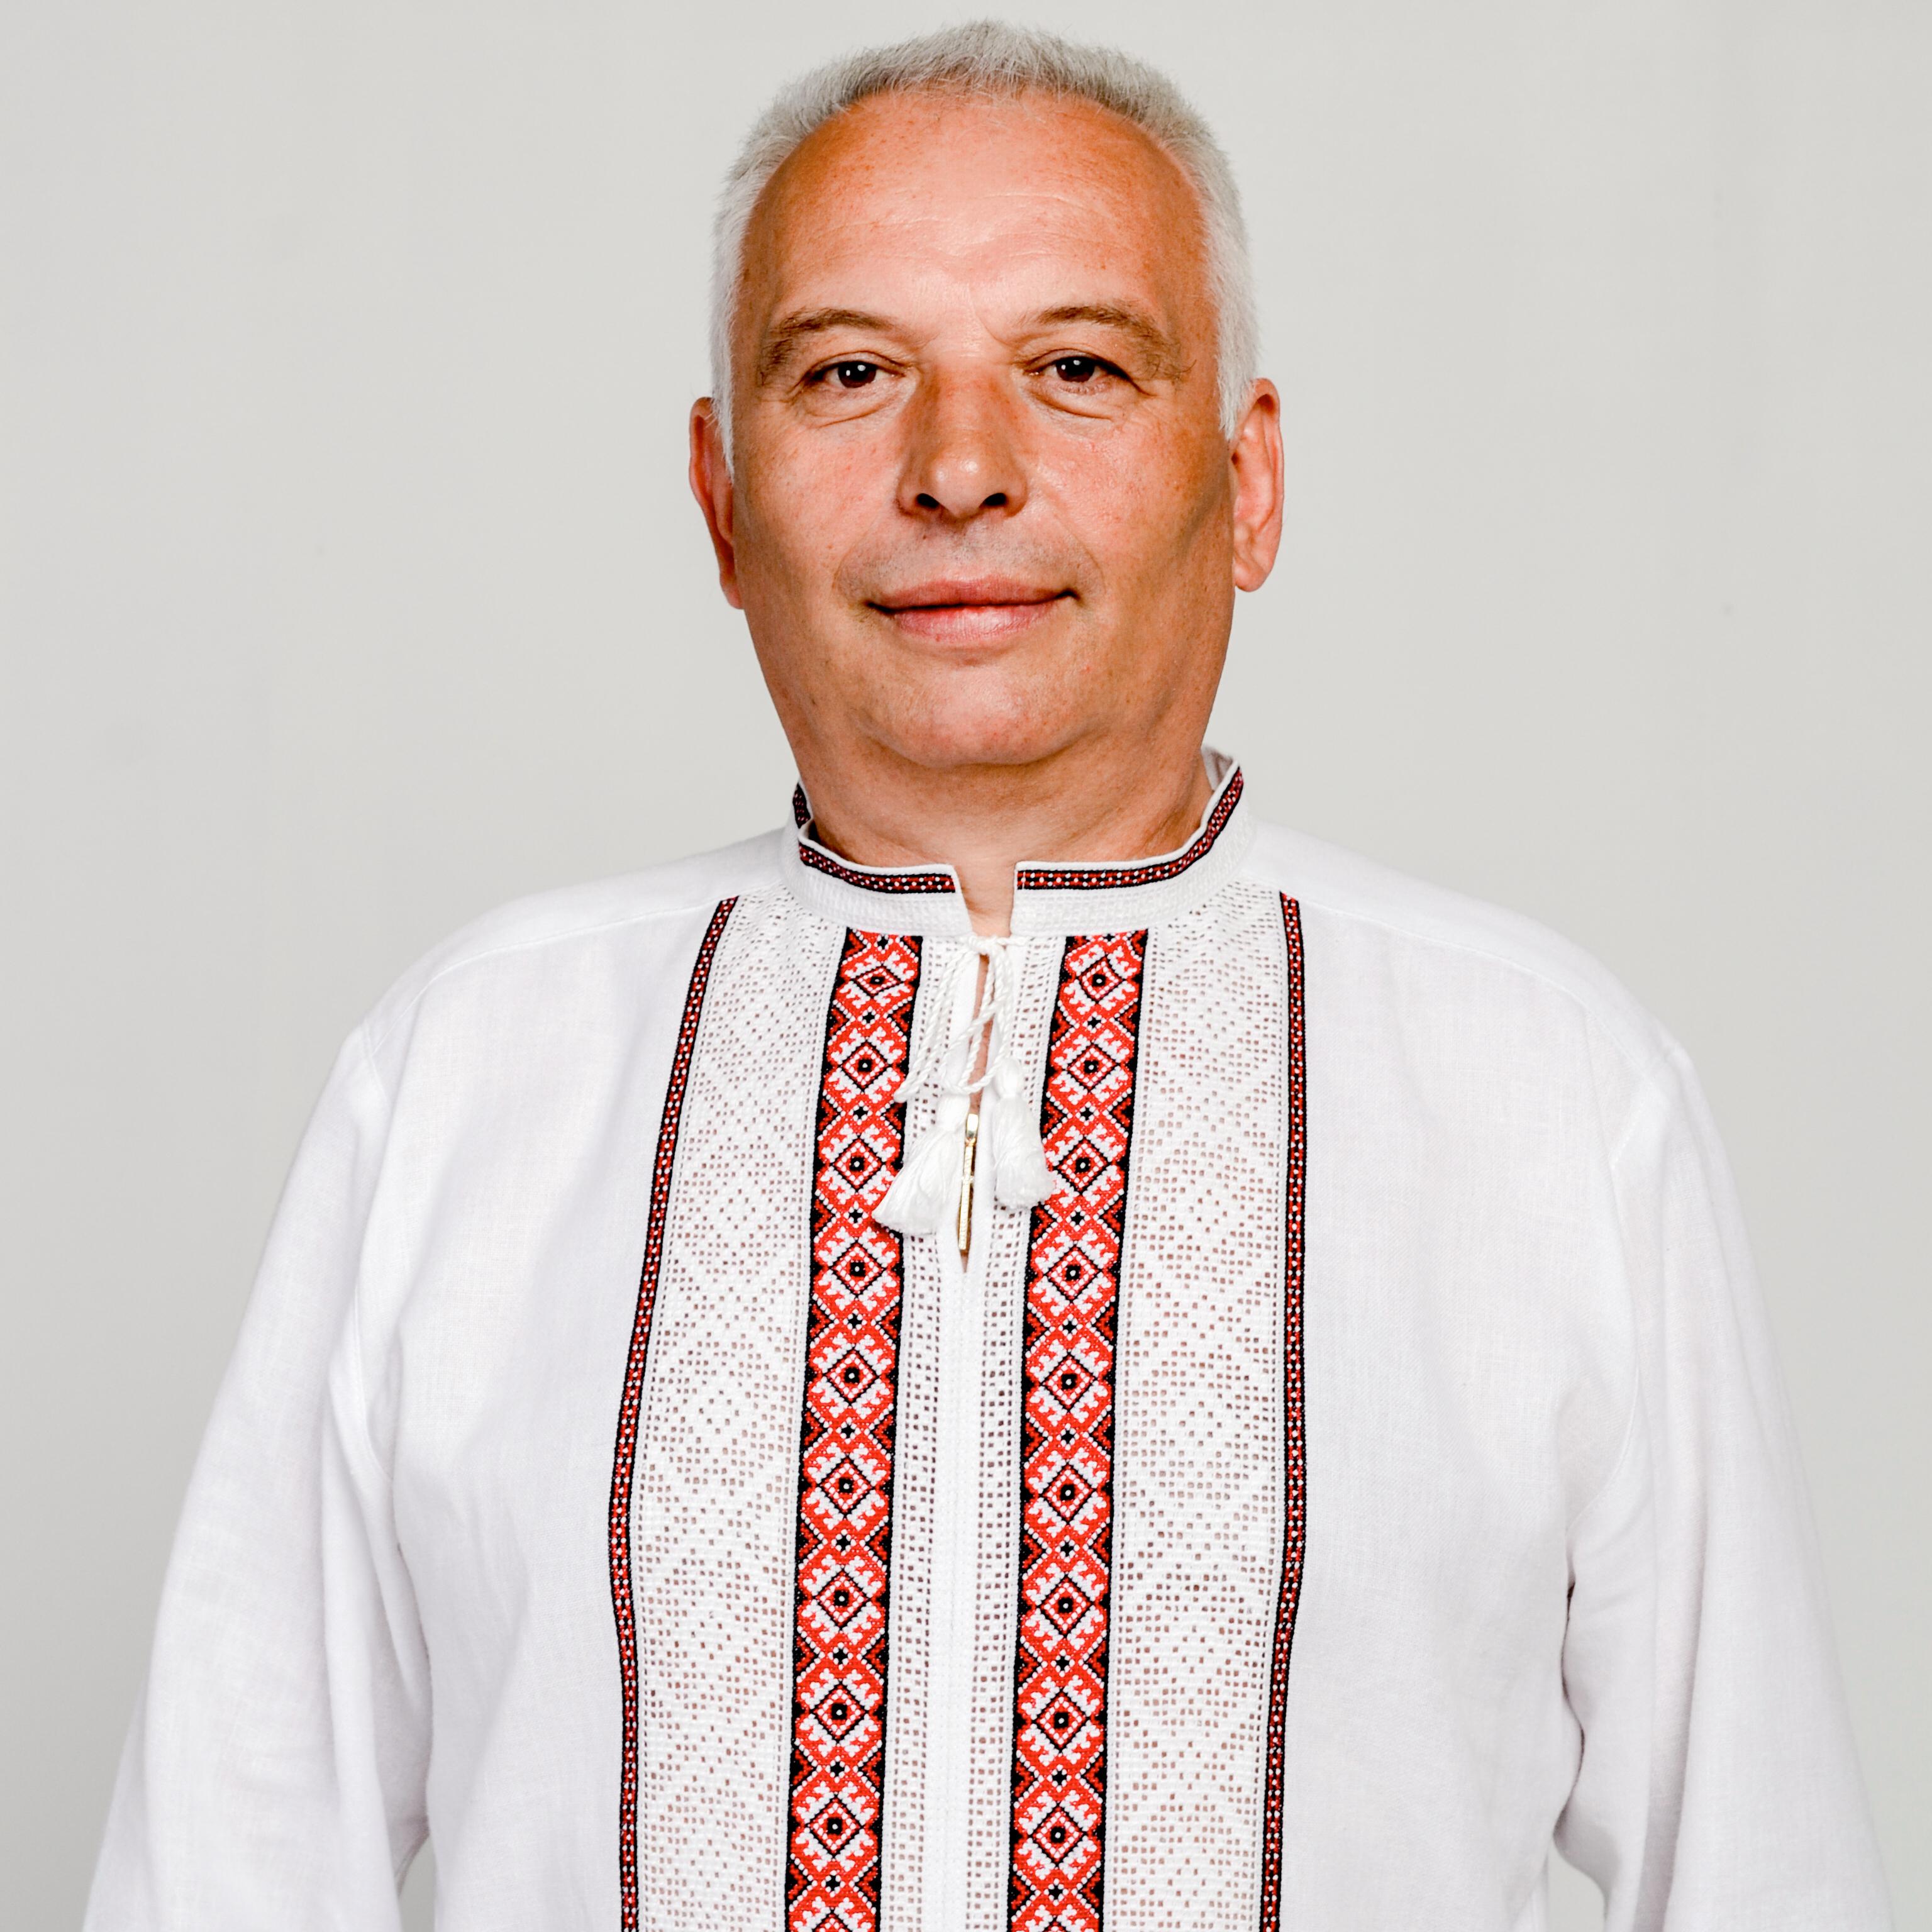 Anatolii Studilko